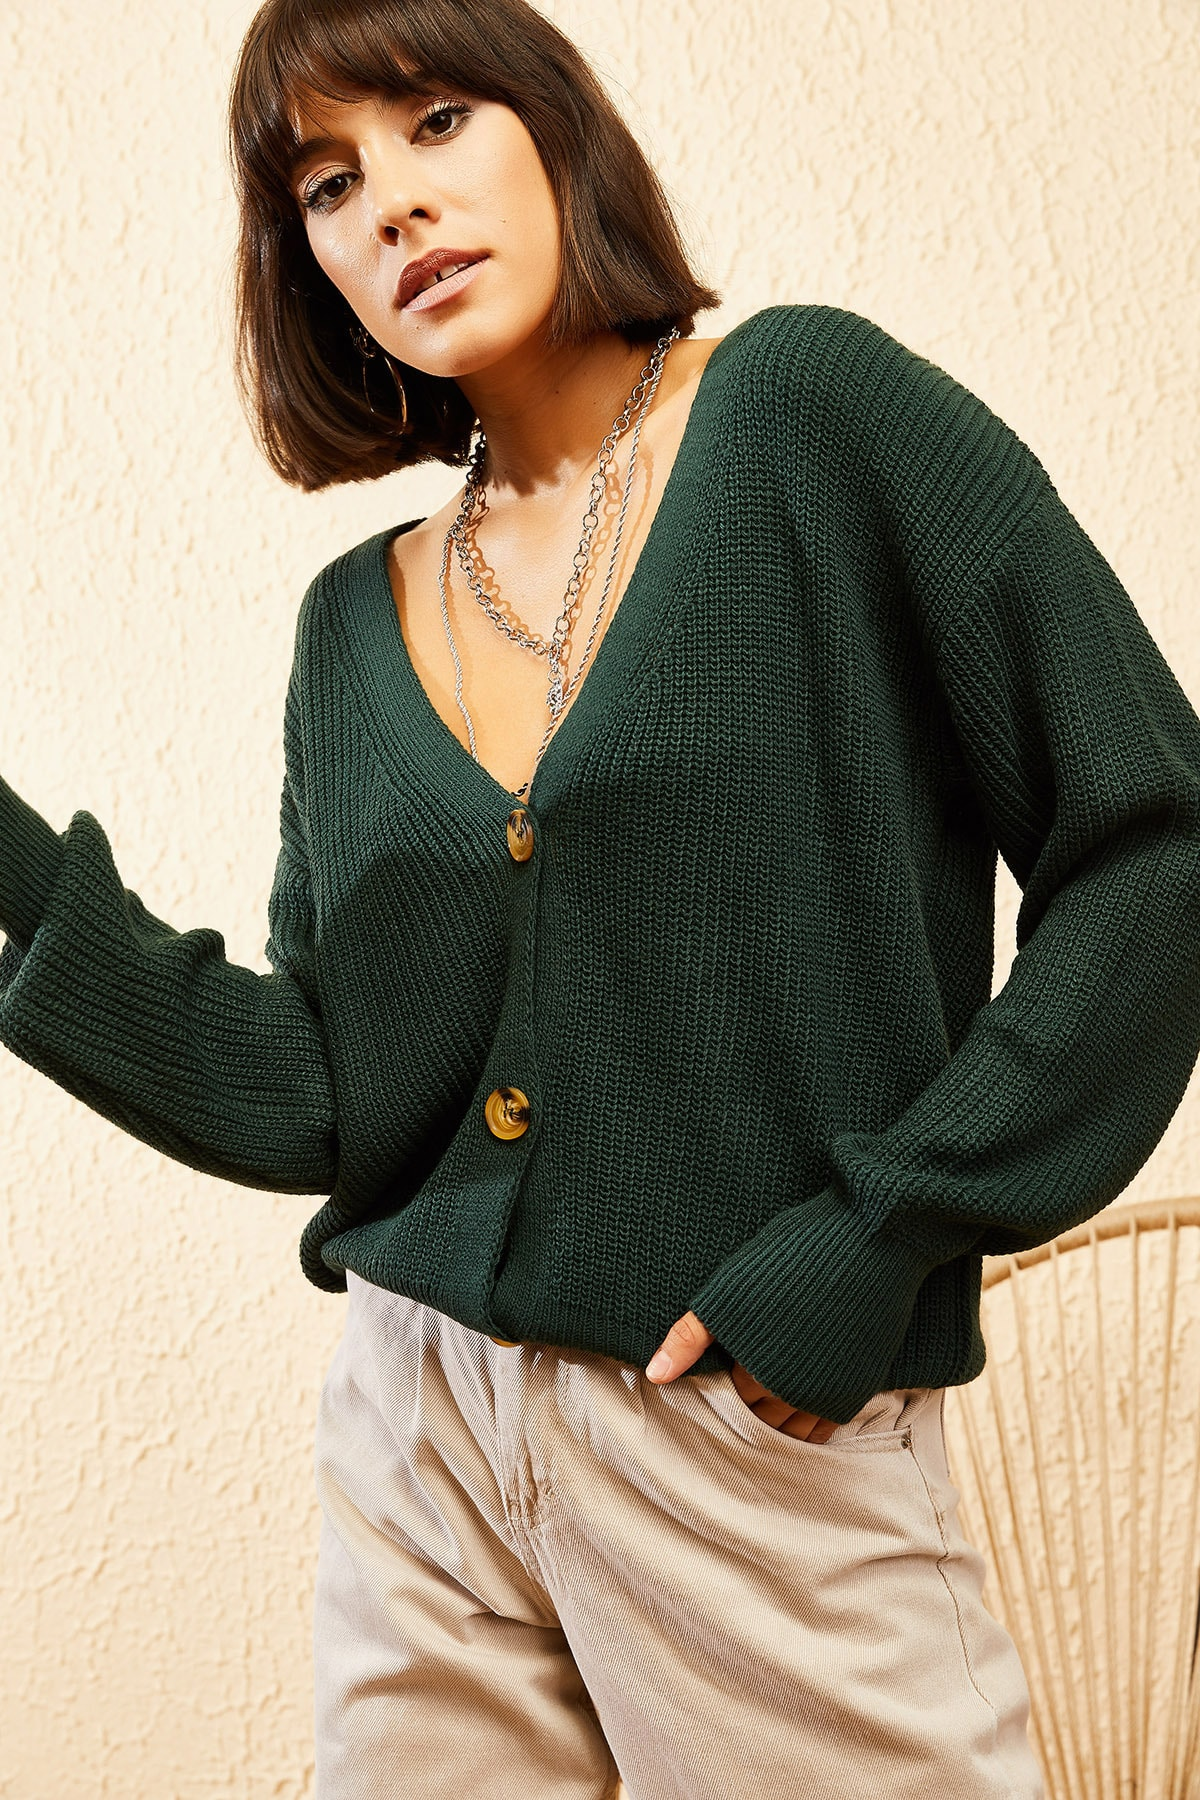 Bianco Lucci Kadın Yeşil 3 Düğmeli V Yaka Triko Hırka 10121004 2